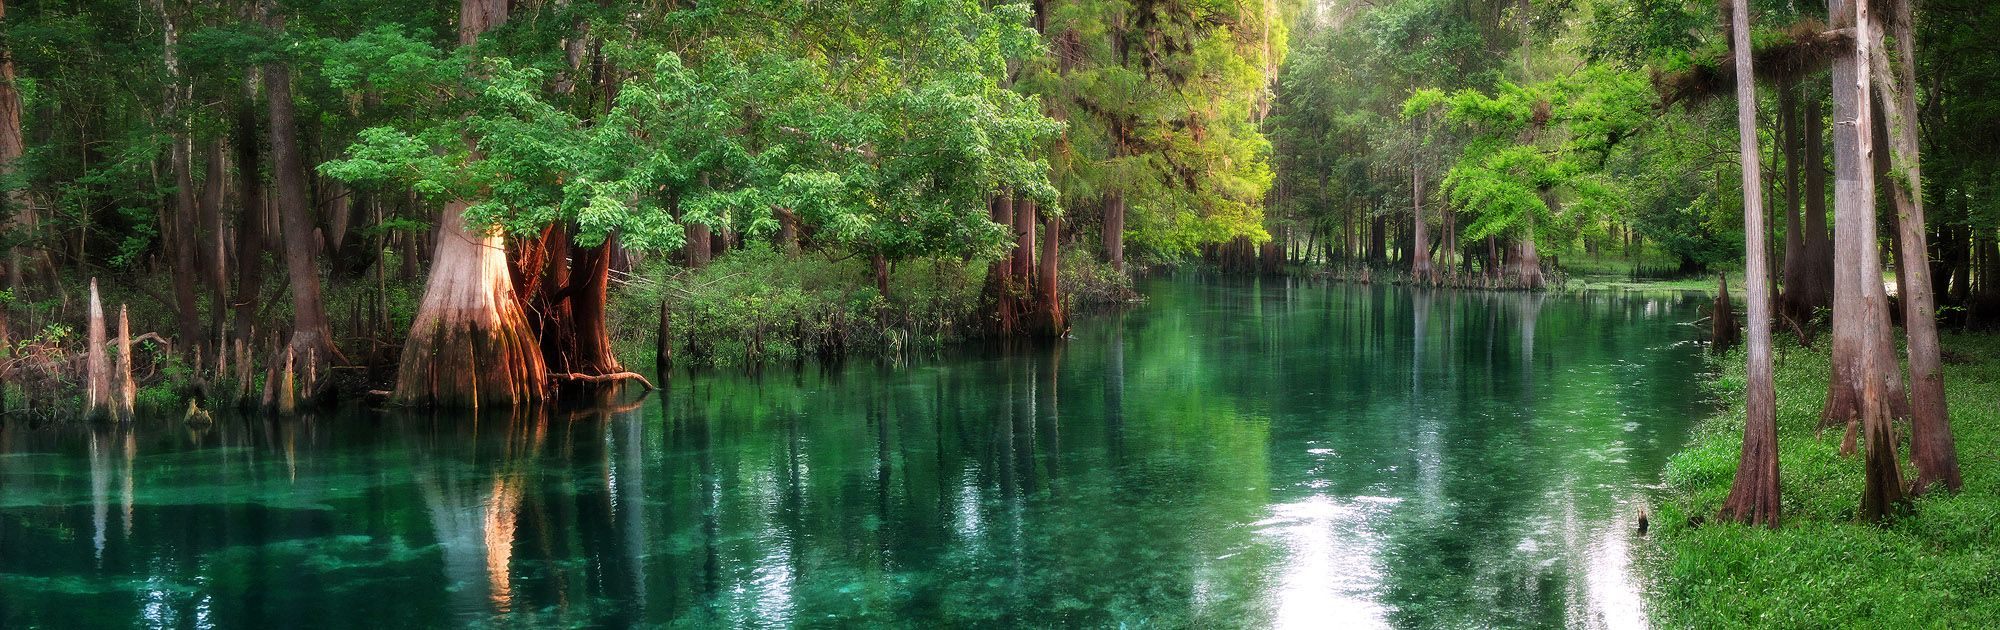 Central Florida's SpringFed Ichetucknee River at Dawn [OC